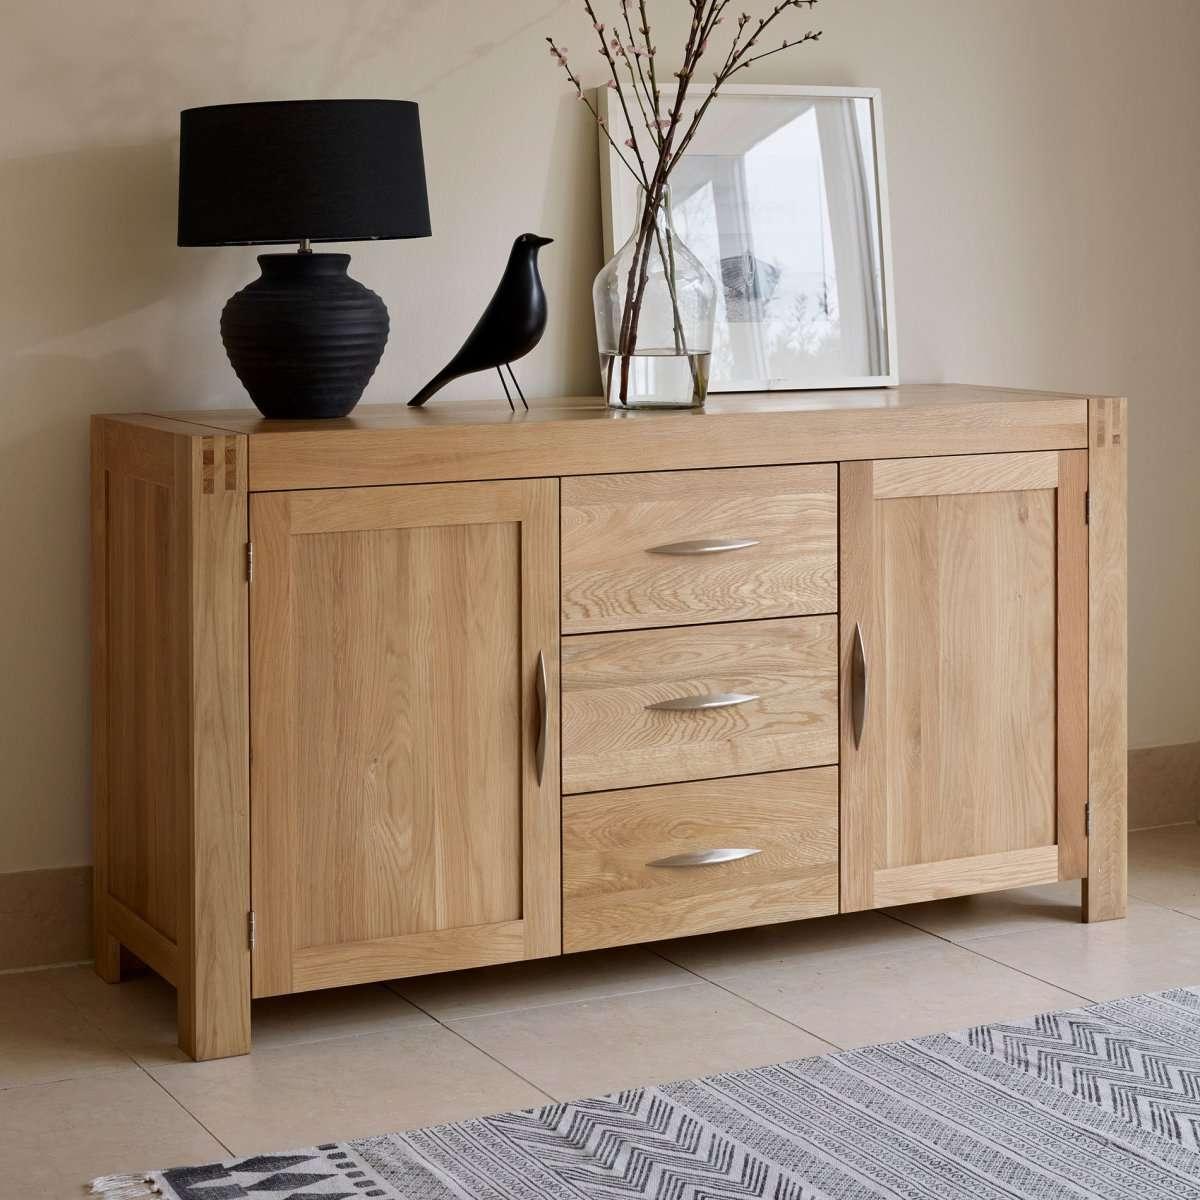 Alto Natural Solid Oak Large Sideboard | Oak Furniture Land In Cream And Oak Sideboards (View 17 of 20)